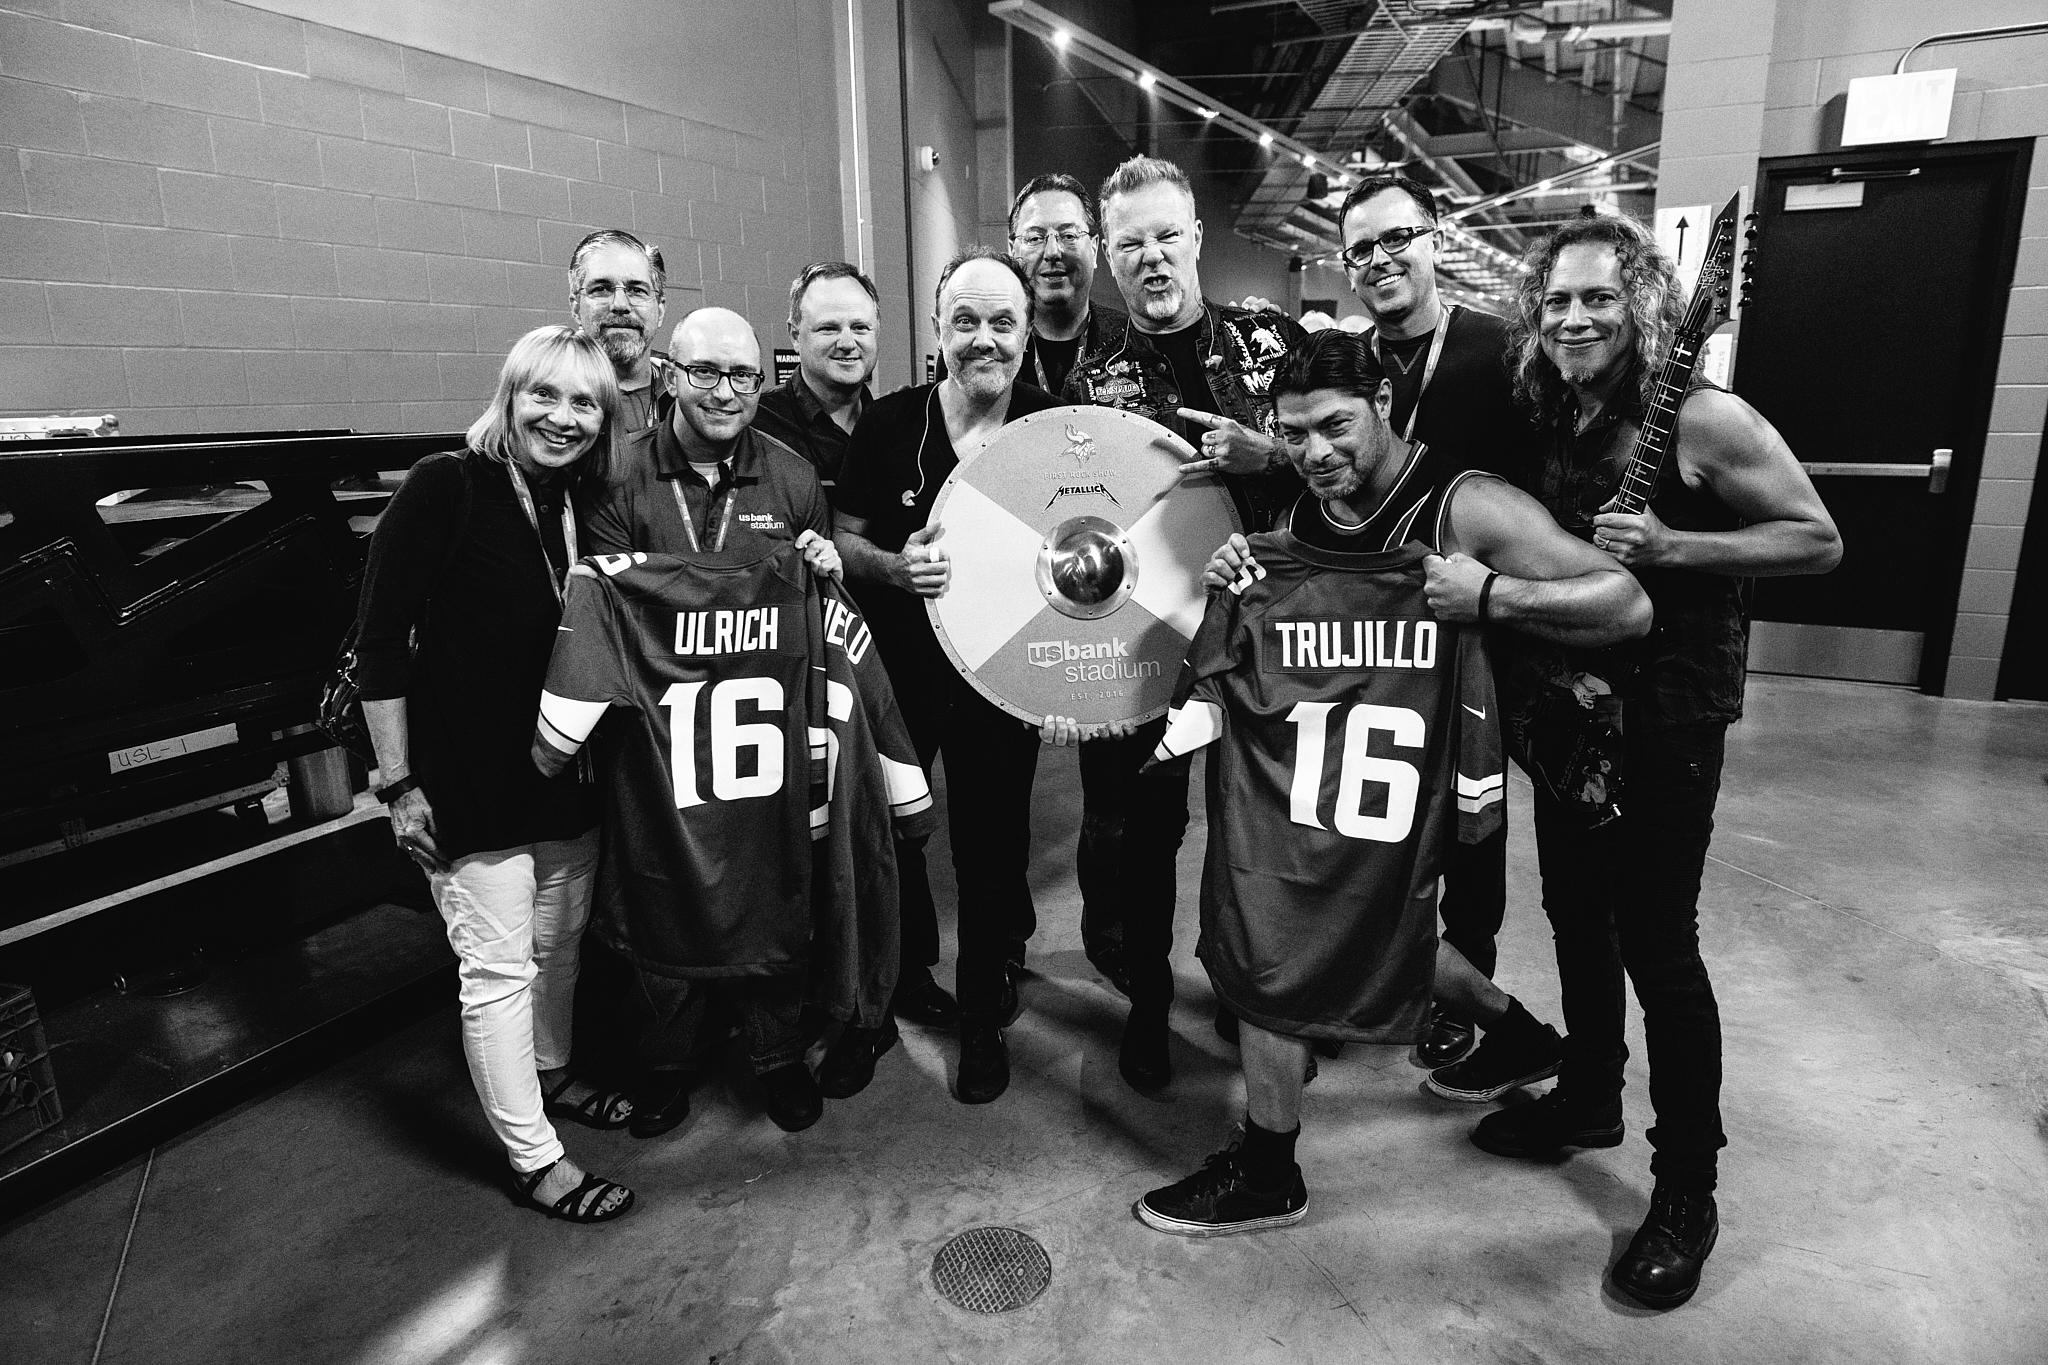 First_Rock_Concert_Metallica_US_Bank_Stadium_Minneapolis_Minnesota_Photography_By_Joe_Lemke_016.JPG